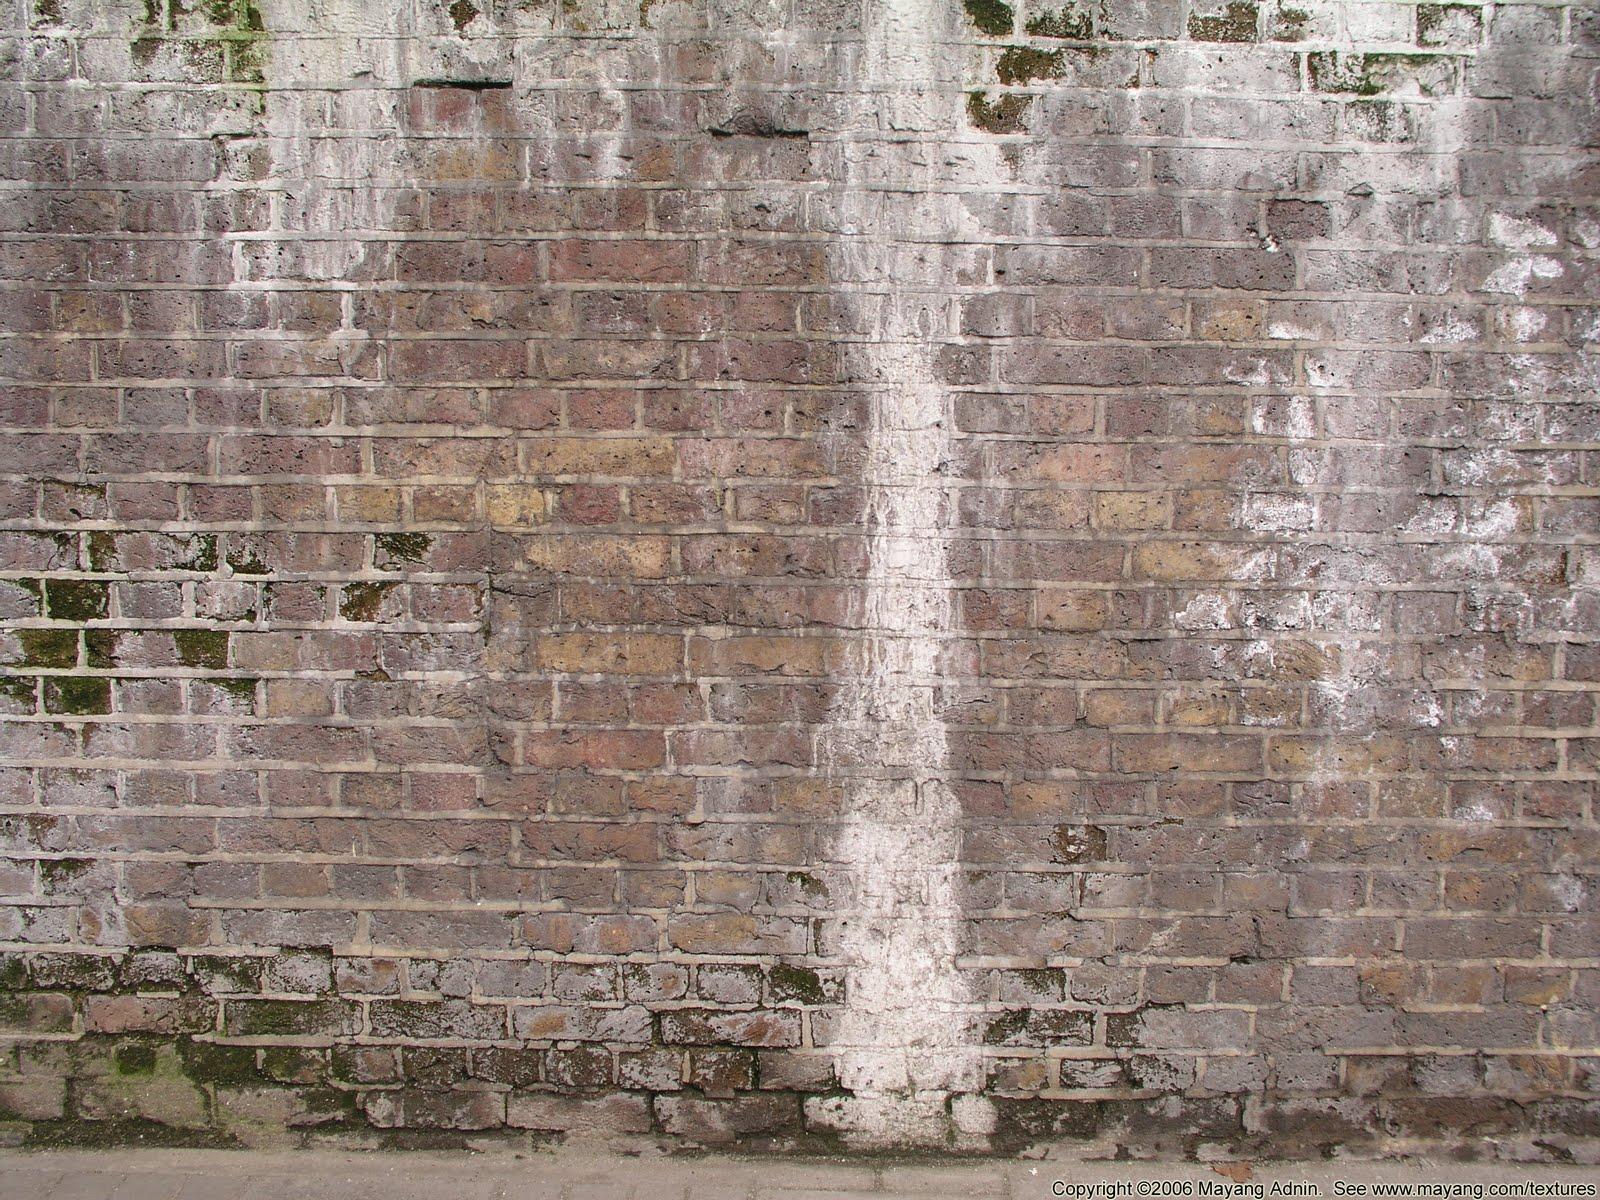 Fotograf a 3 texturas y paredes - Texturas de paredes ...